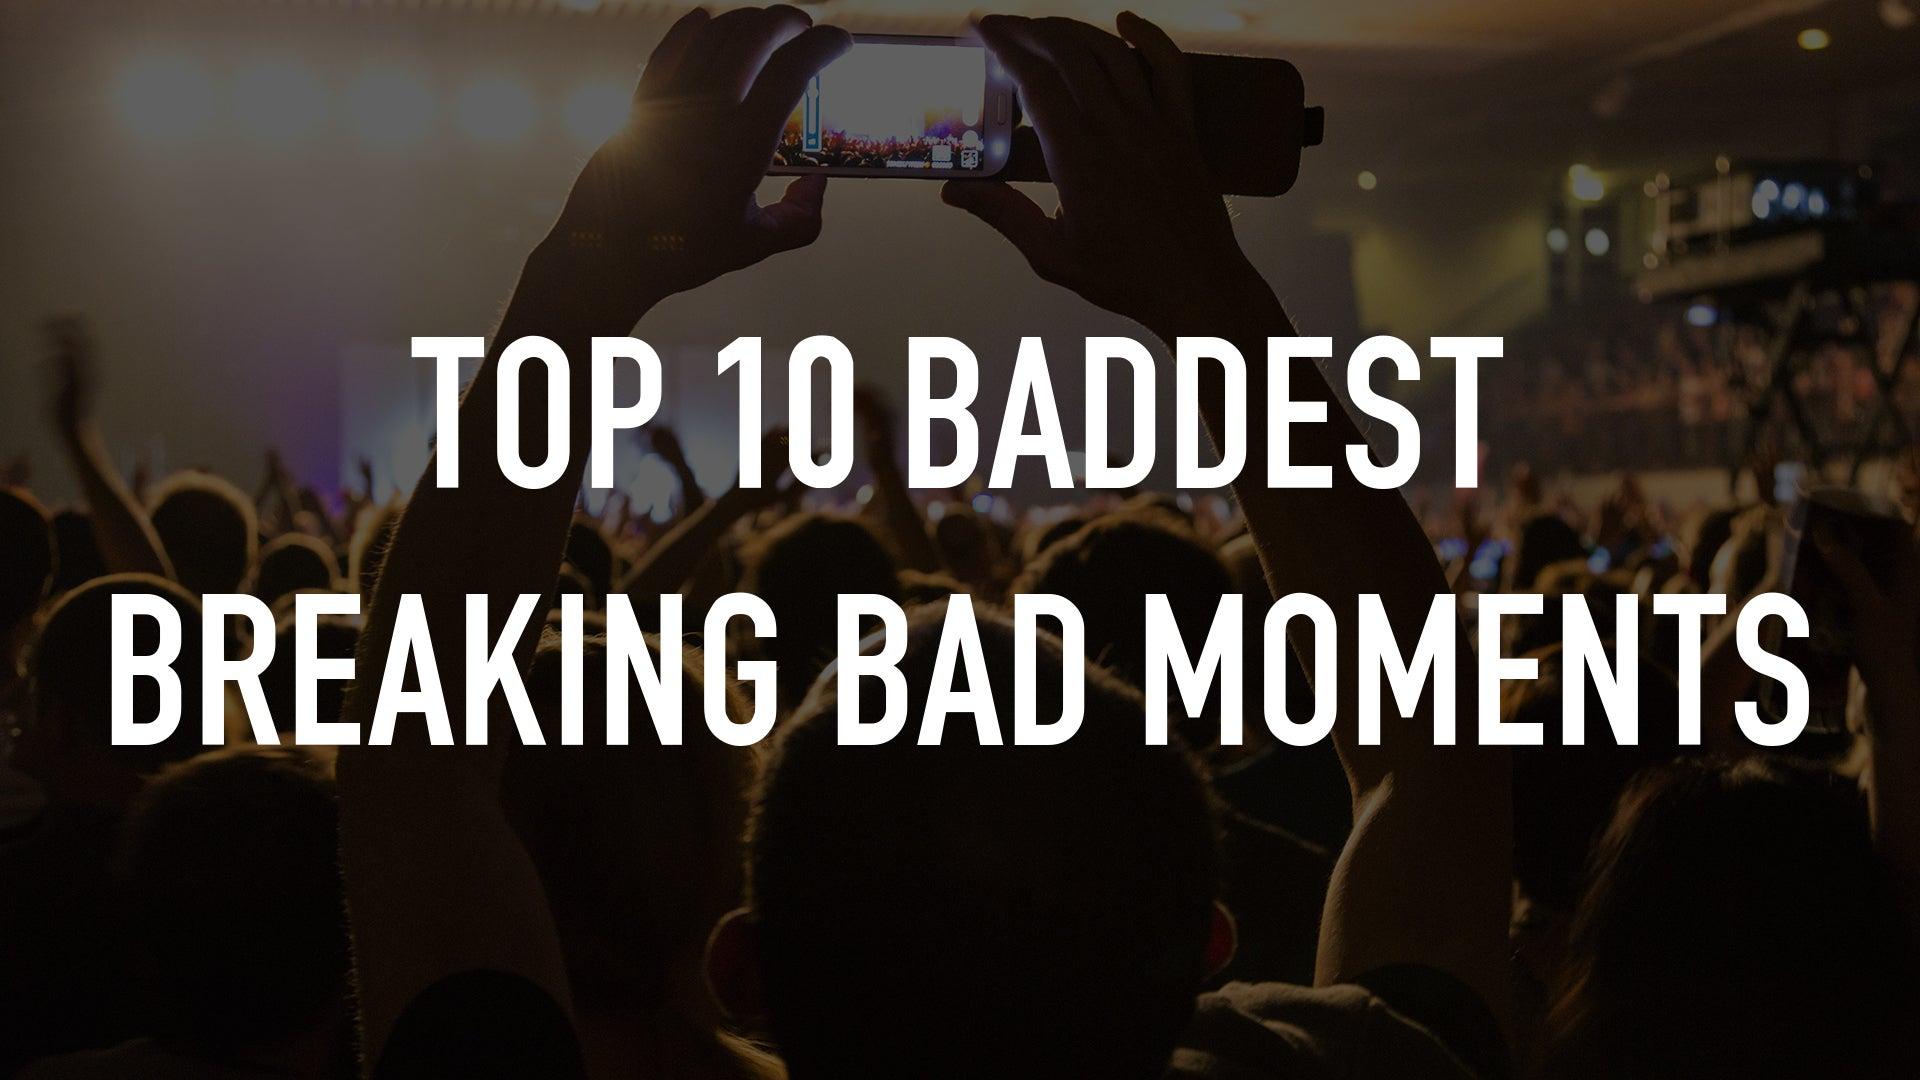 Top 10 Baddest Breaking Bad Moments